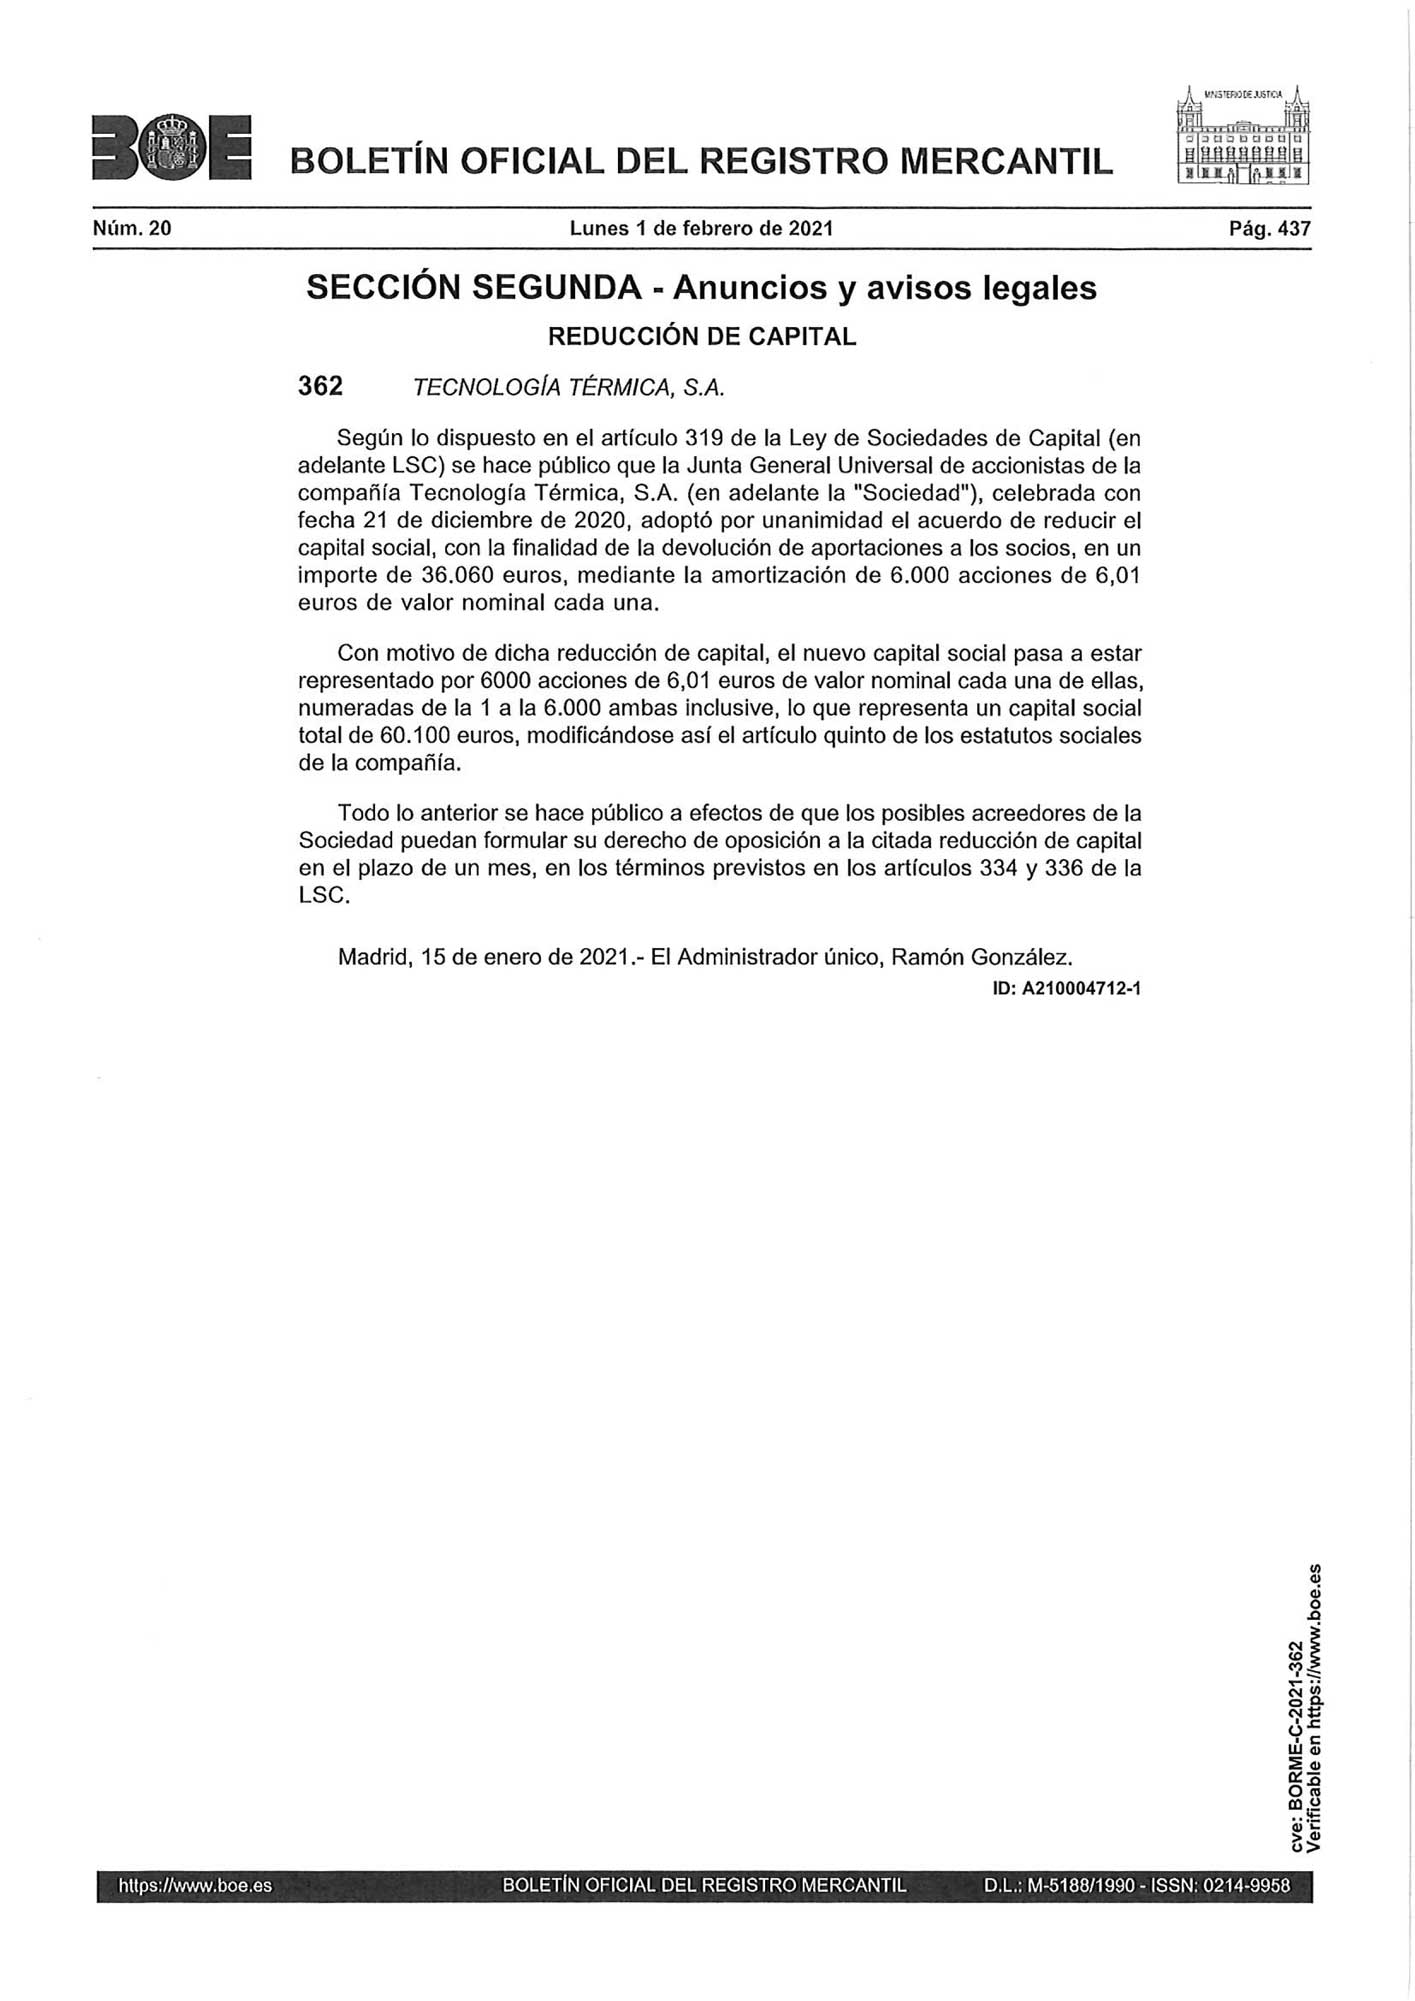 https://tecnotermica.es/wp-content/uploads/2021/03/BORME.jpg